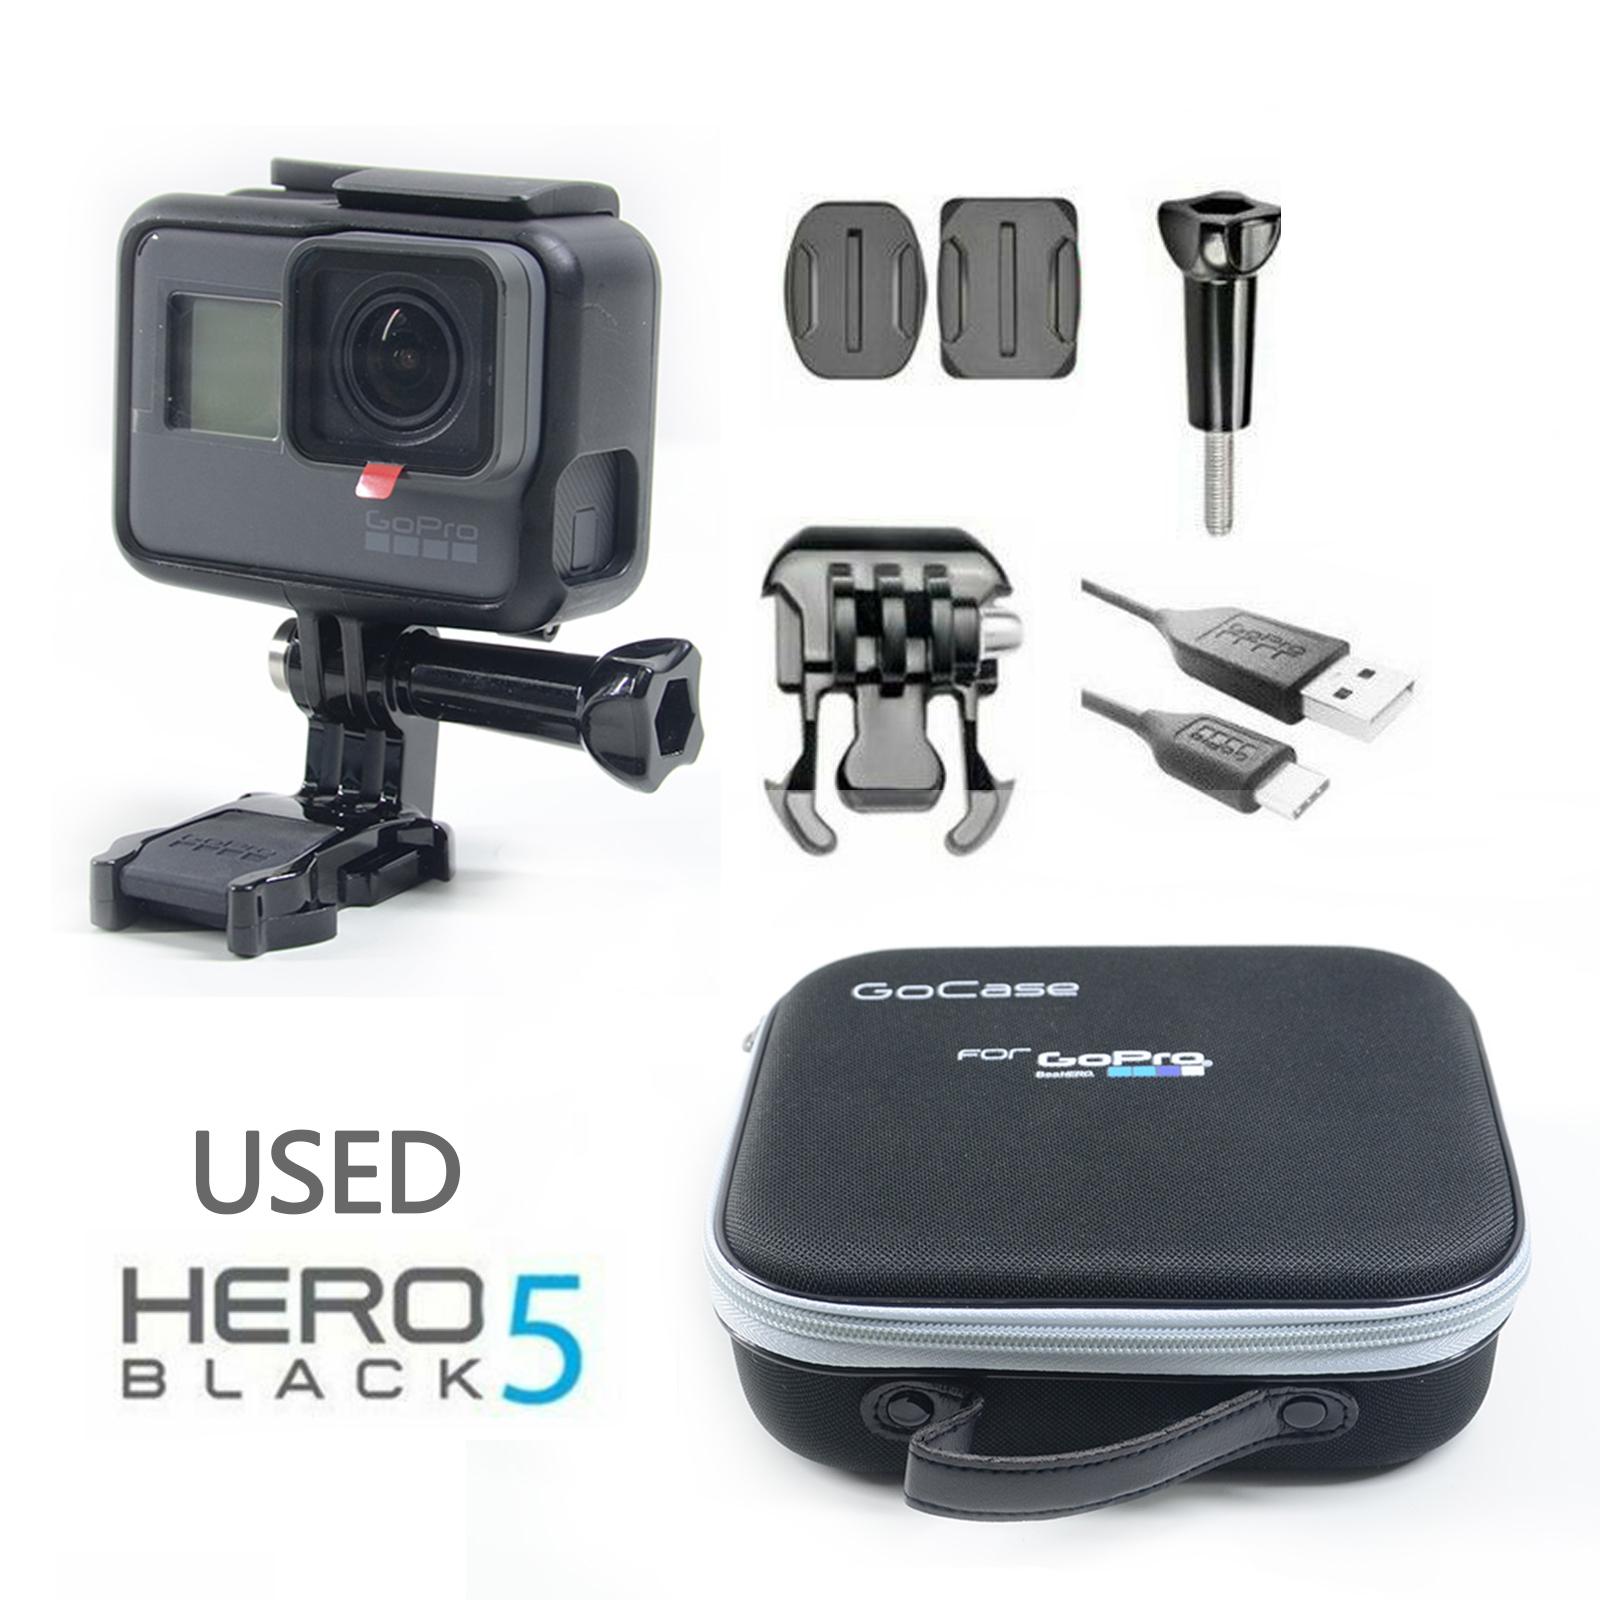 accessories Used GoPro Hero 5 Black Edition 4K Action Camera Camera bag